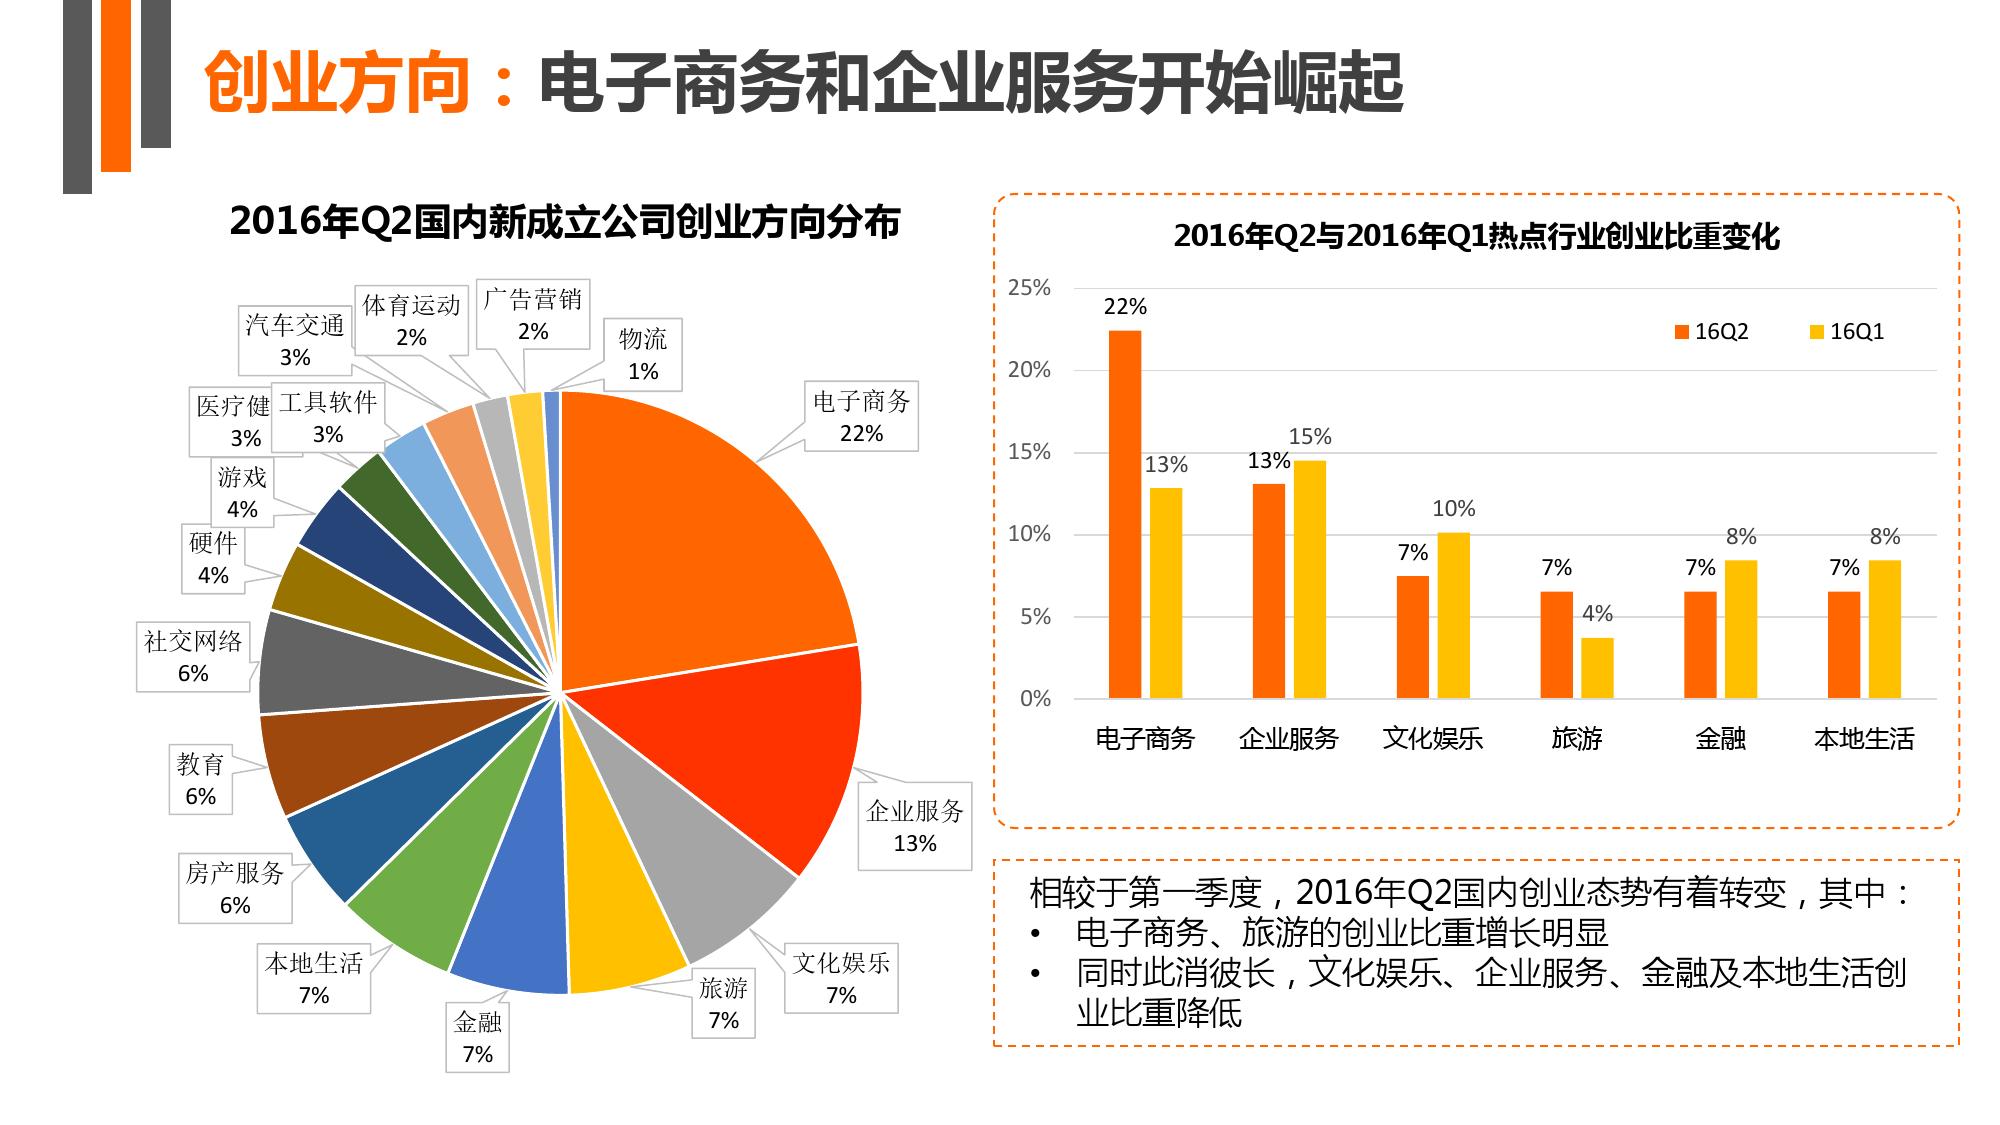 【IT桔子】2016年Q2中国互联网创业投资分析报告_000007